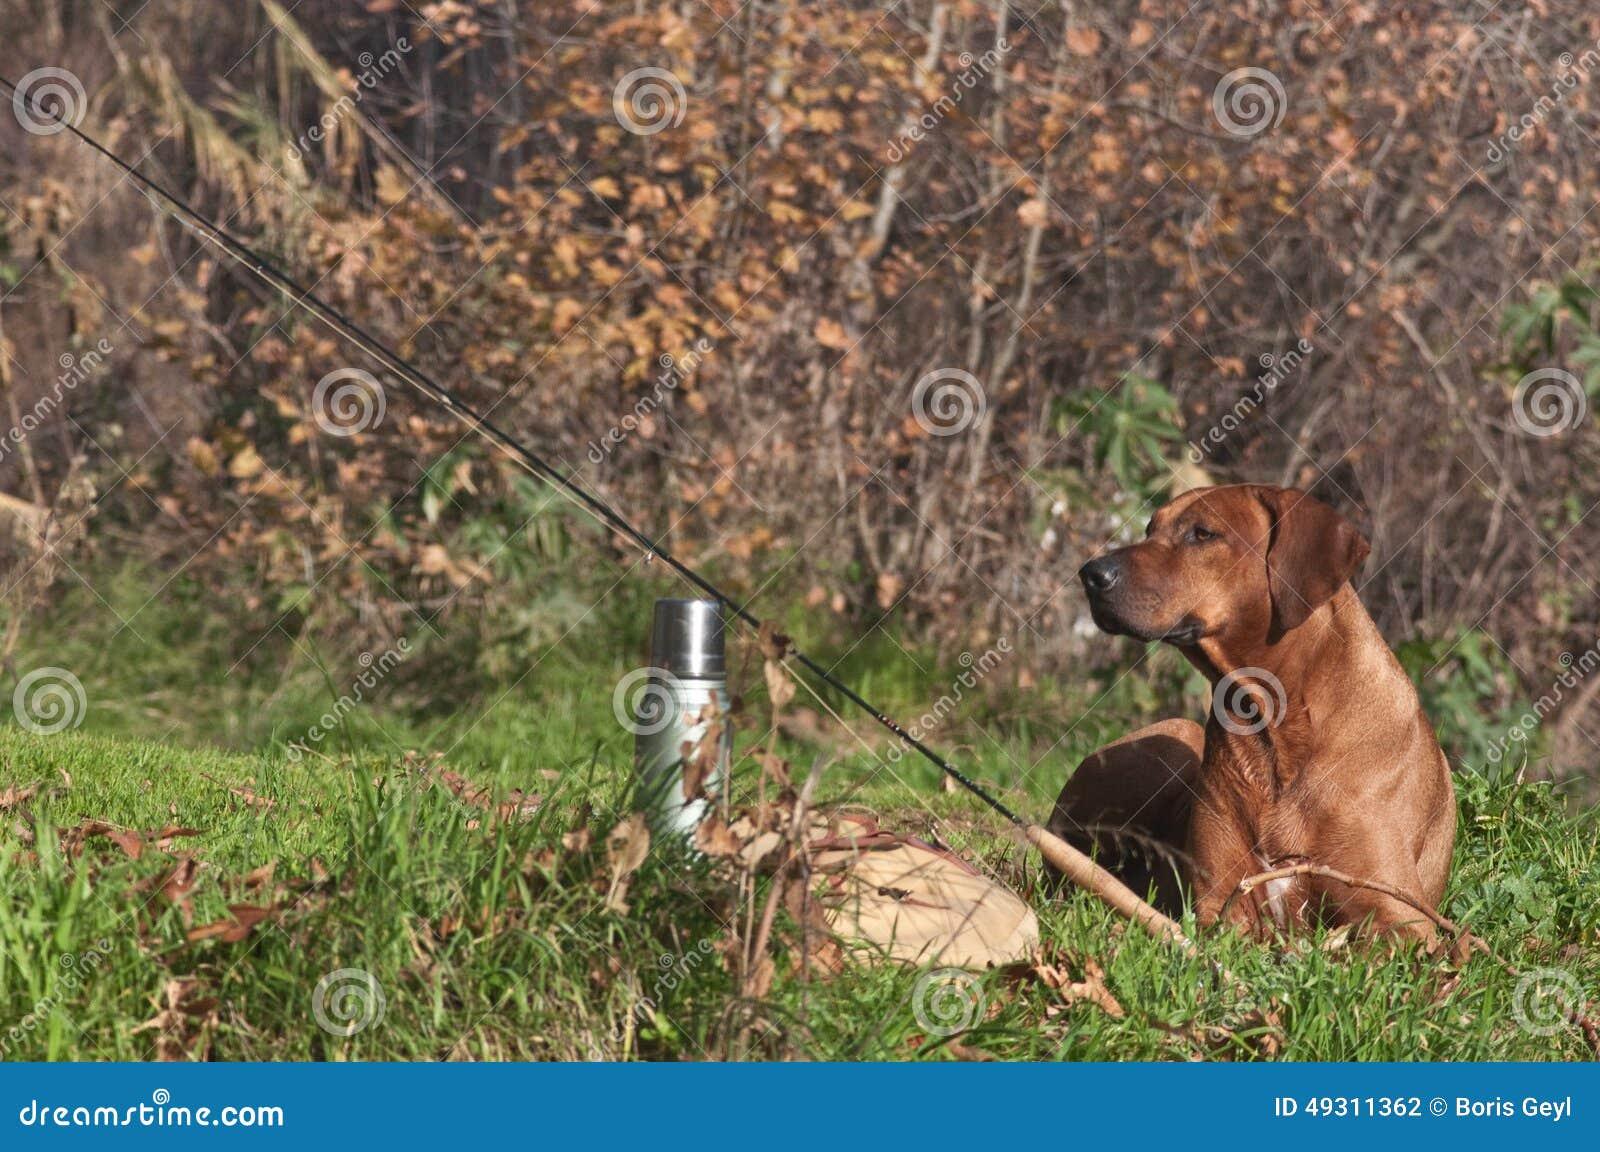 Rhodesian ridgeback lies on grass near fly fishing tackle for Fly fishing supplies near me